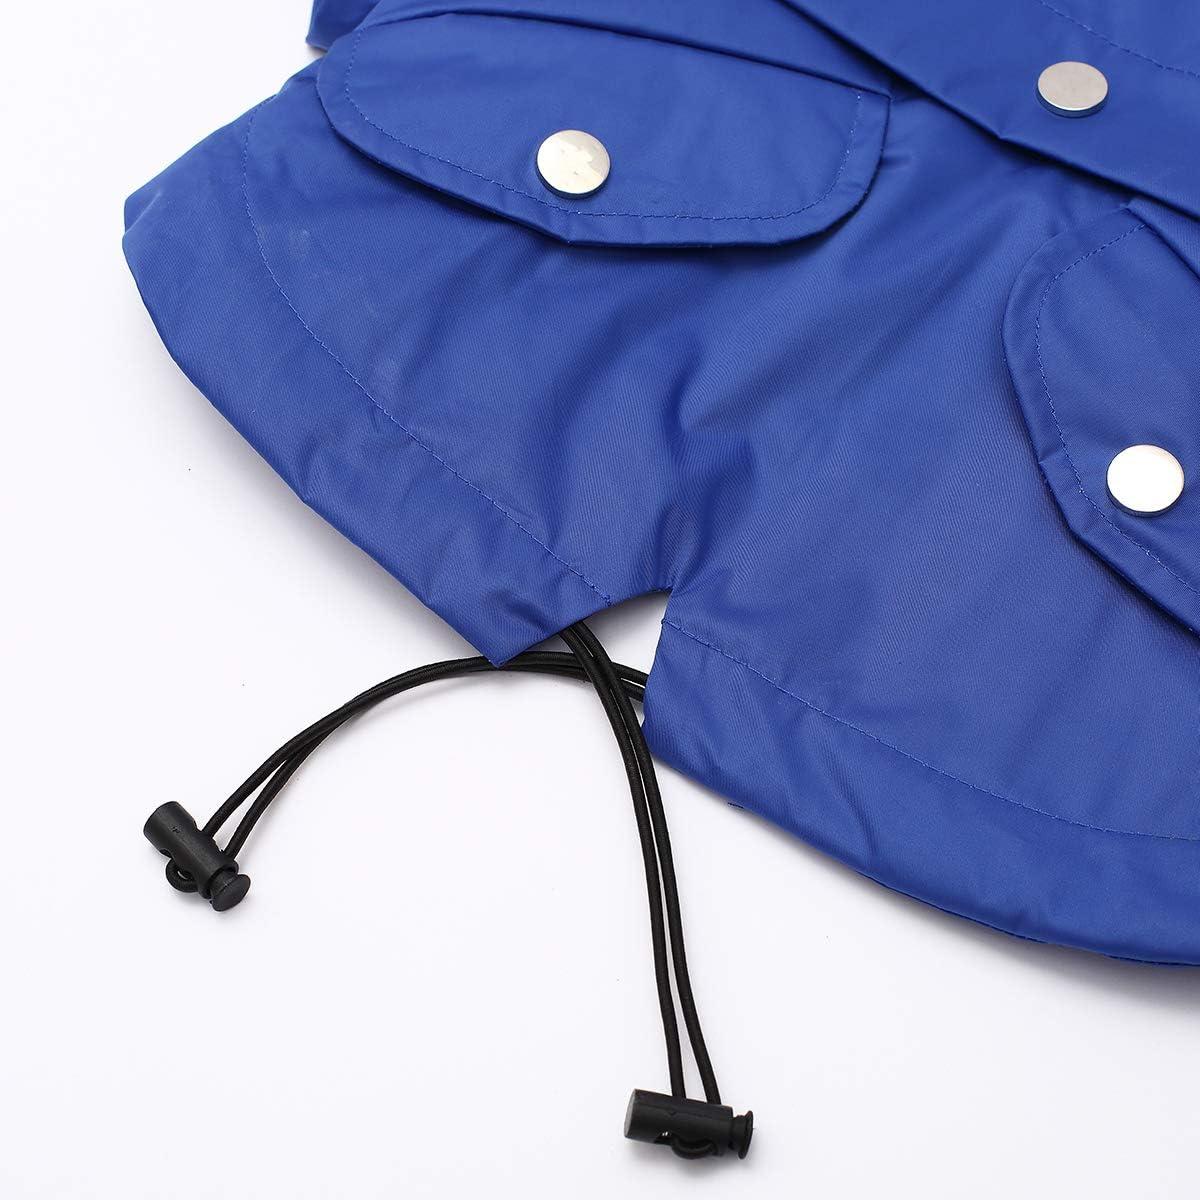 Rain//Water Resistant Removable Hood Morezi Dog Zip Up Dog Raincoat with Reflective Buttons Stylish Premium Dog Raincoats Adjustable Drawstring Size XS to XXL Available